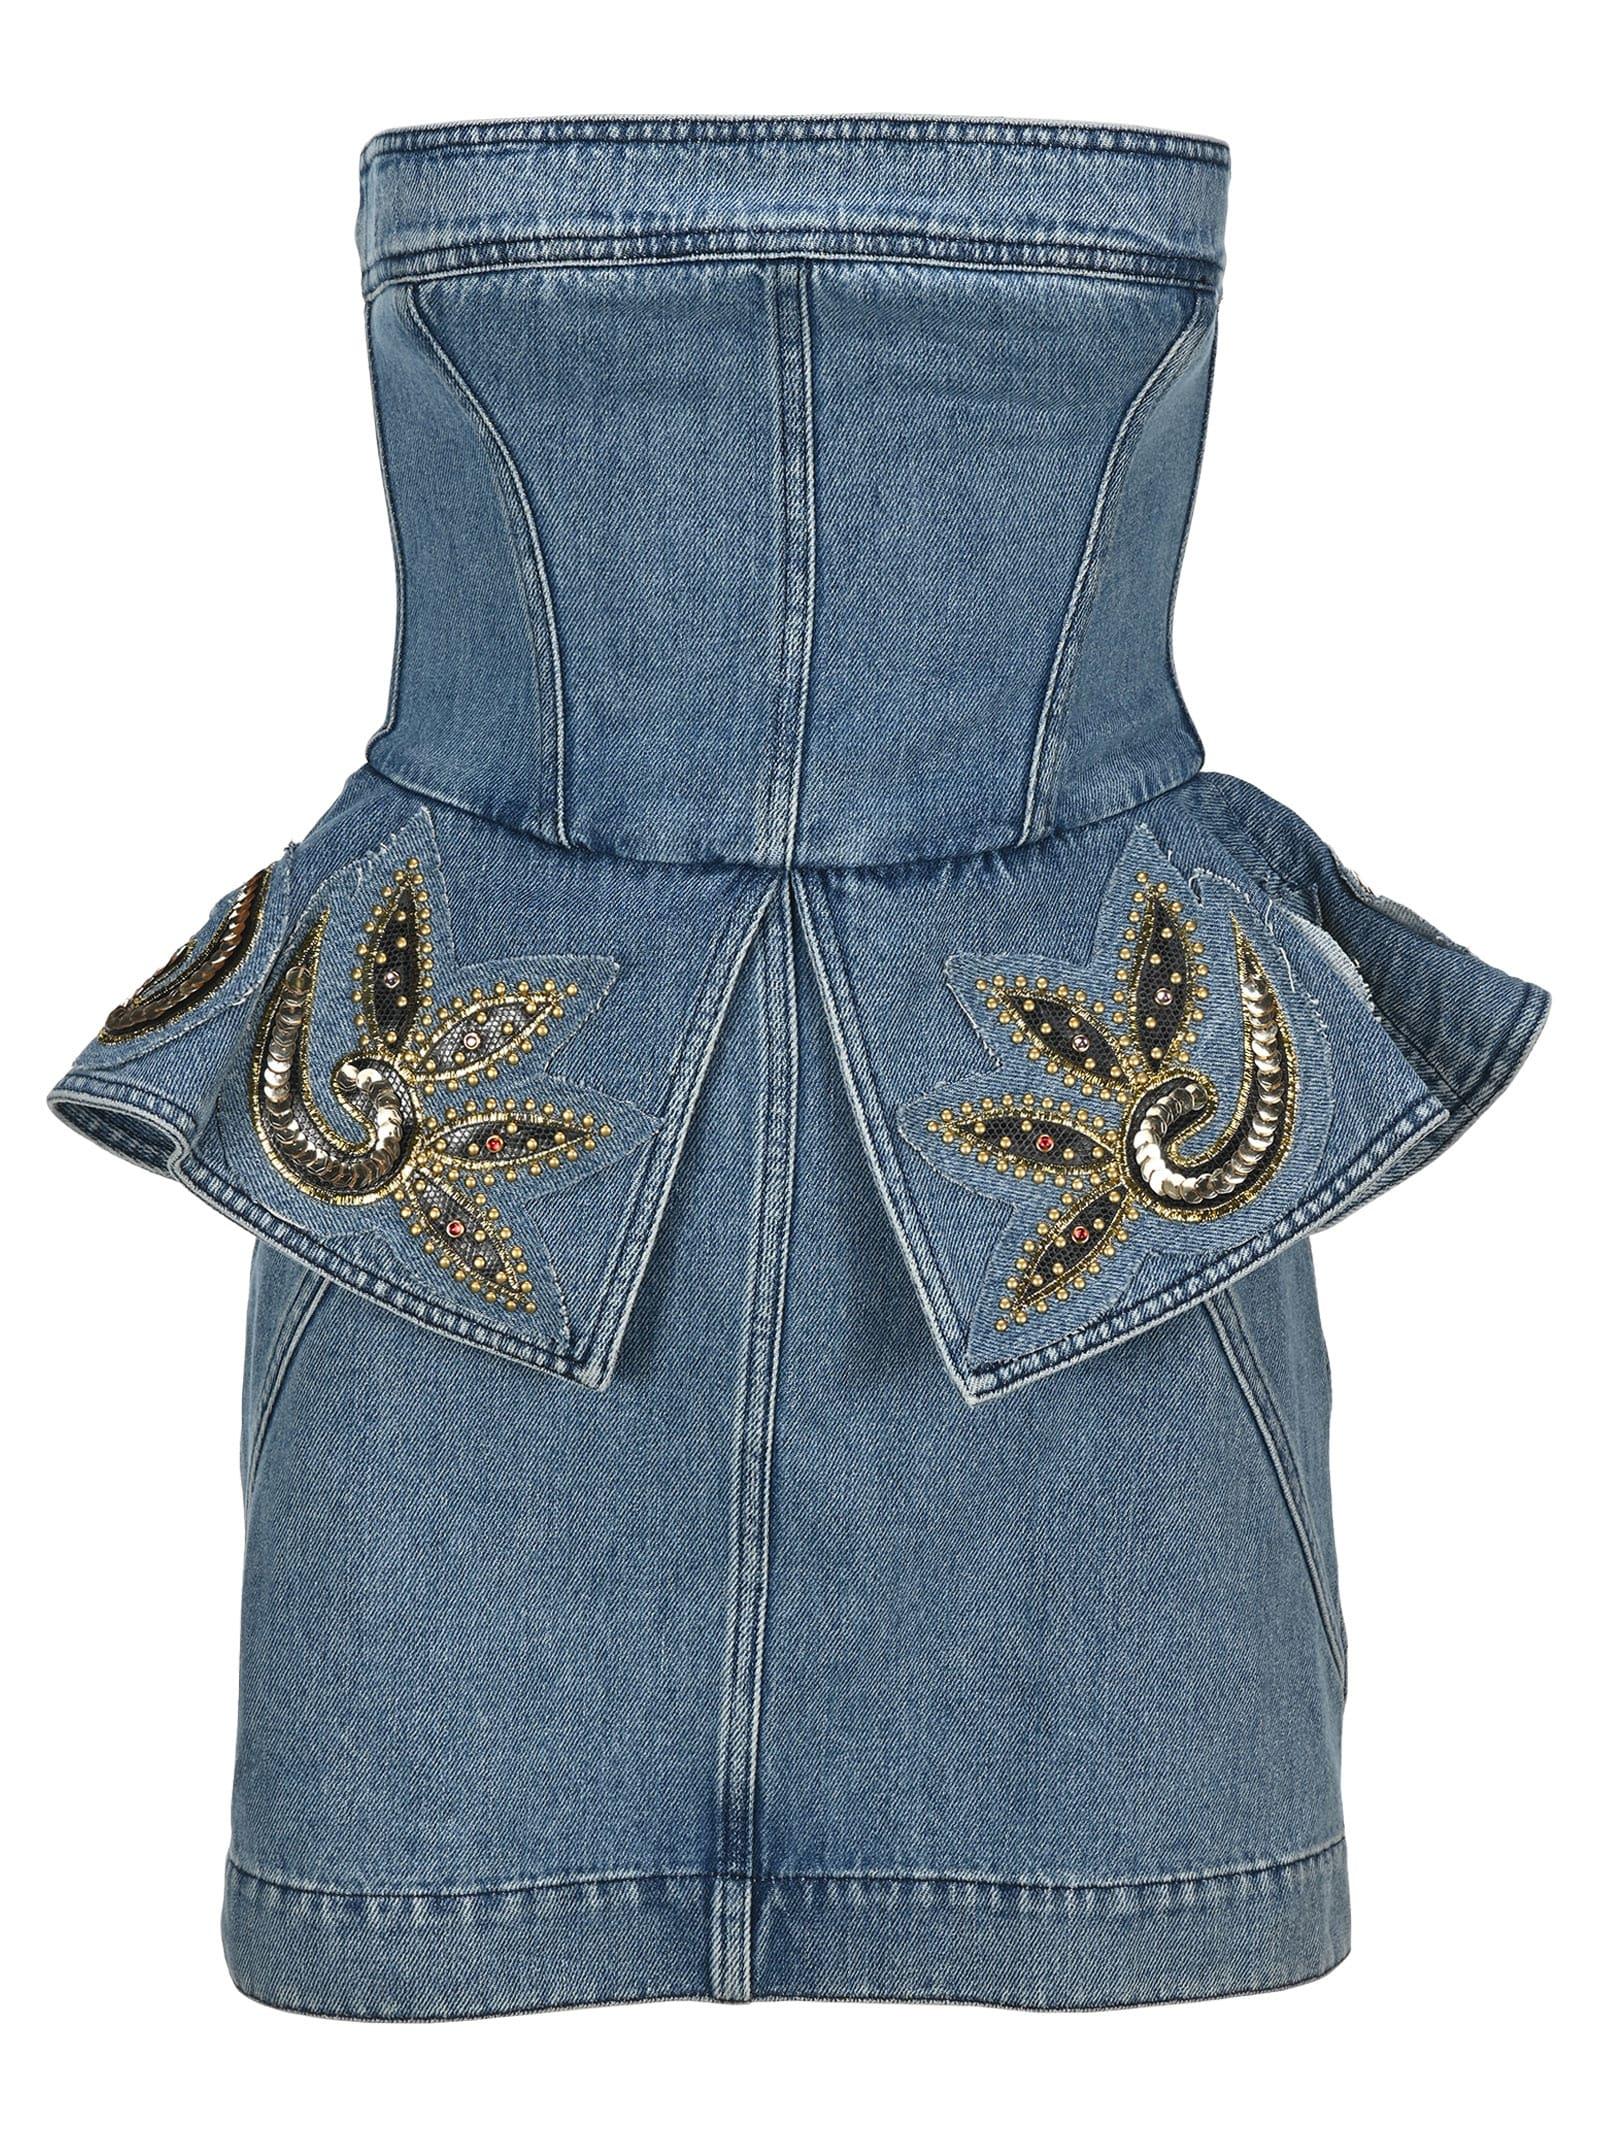 Buy Philosophy Embellished Bustier Denim Mini Dress online, shop Philosophy di Lorenzo Serafini with free shipping